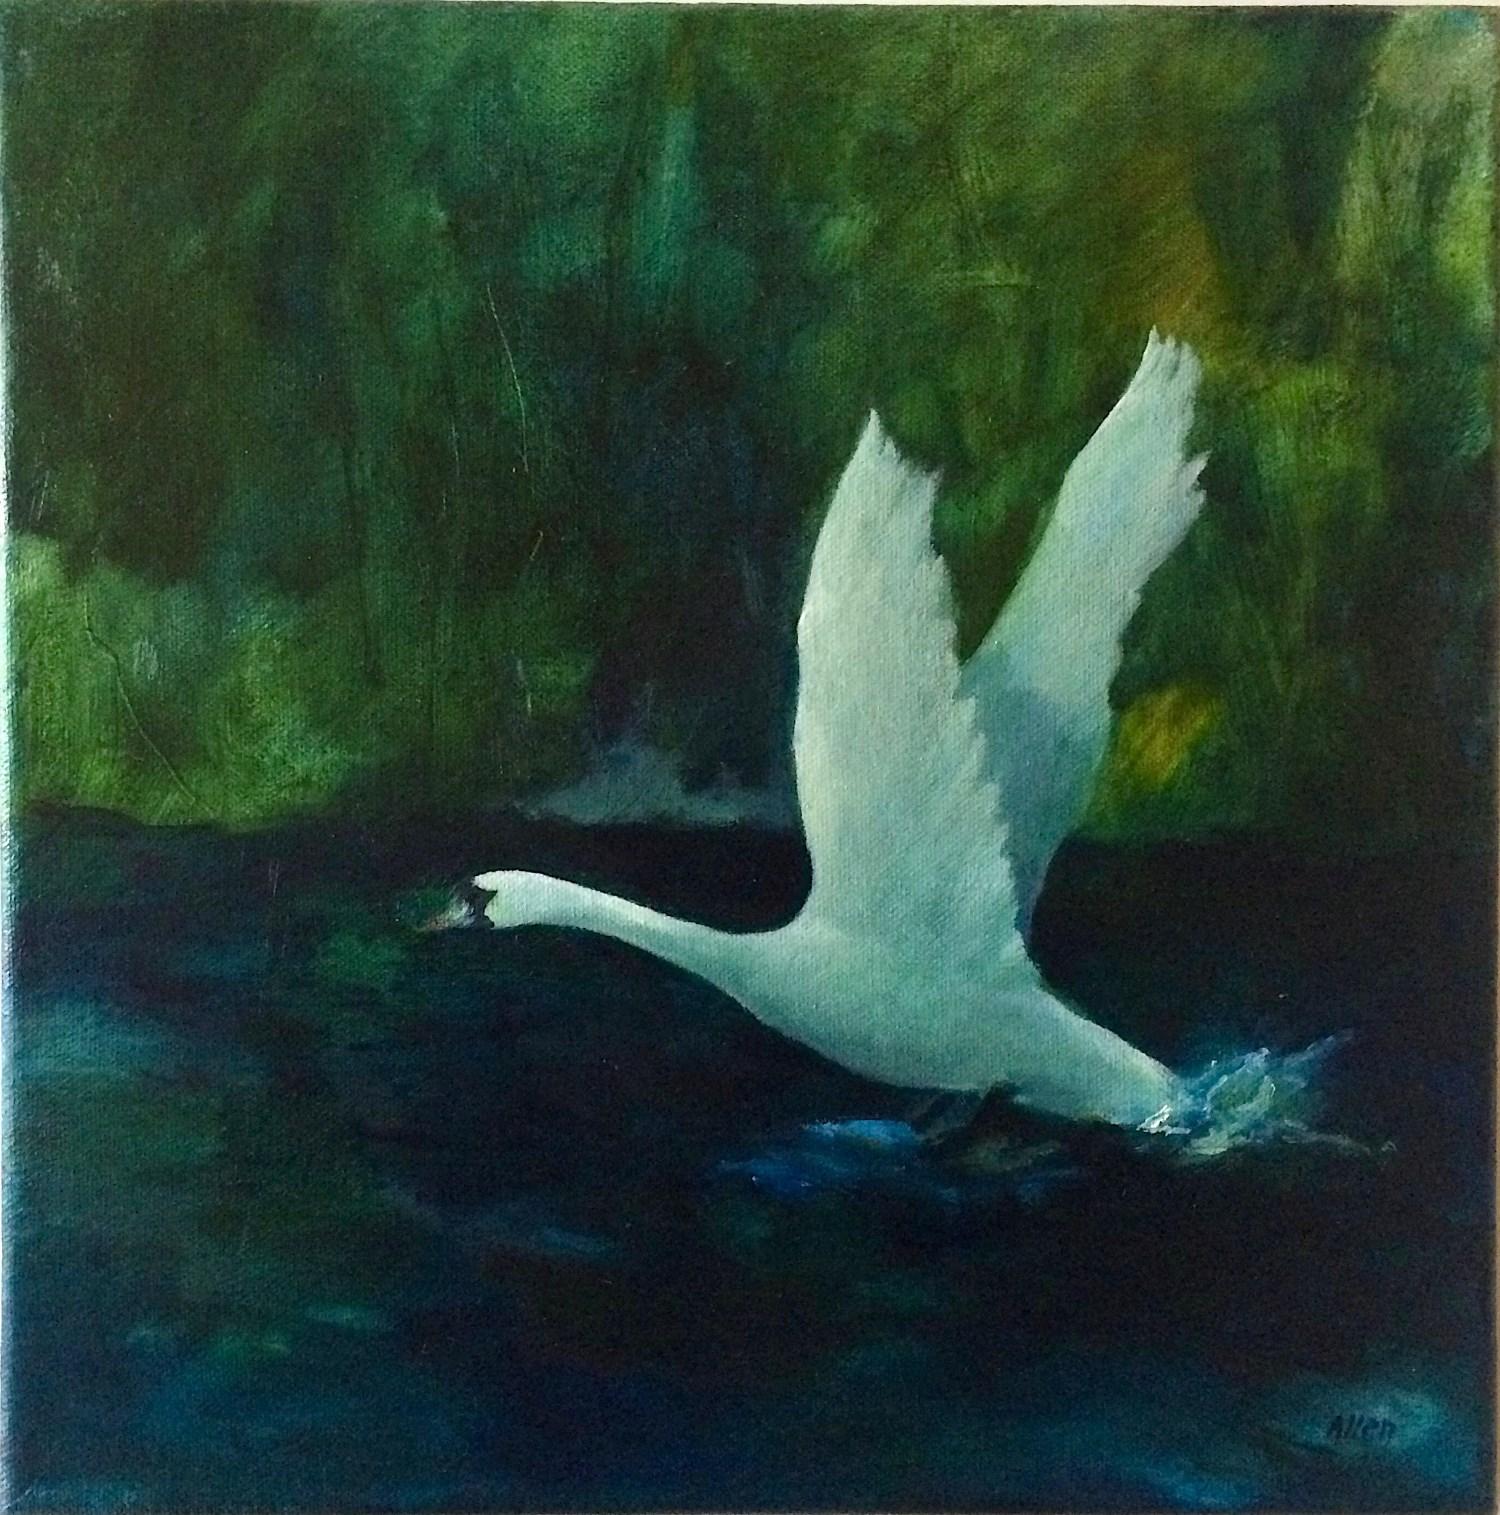 ..wings half spread for flight